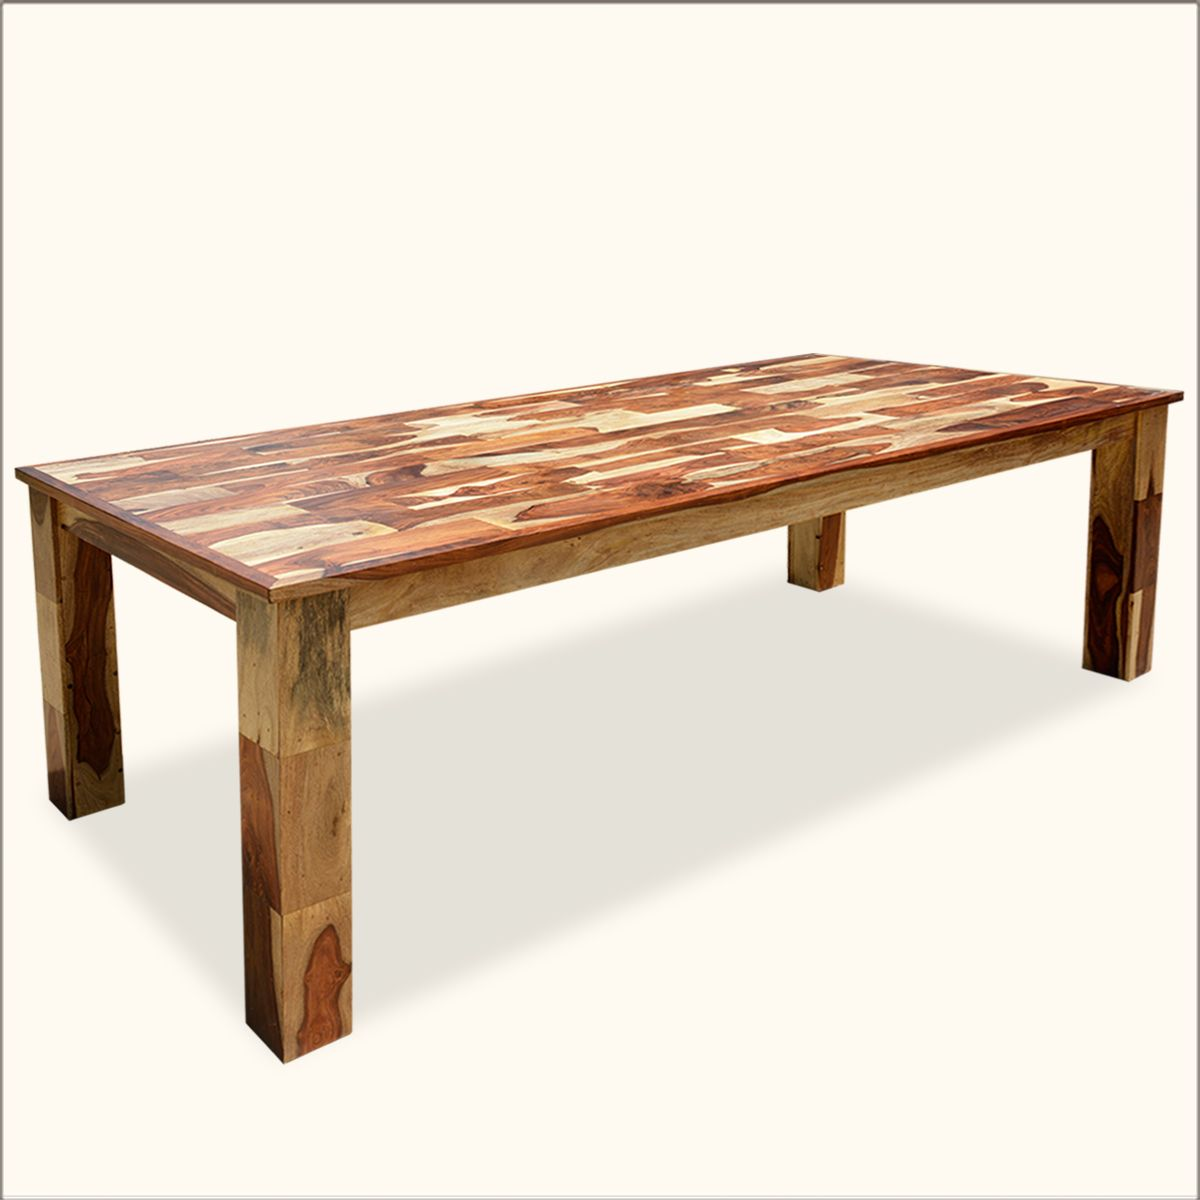 contemporary wooden tile large rectangular solid wood dining table  - contemporary wooden tile large rectangular solid wood dining table